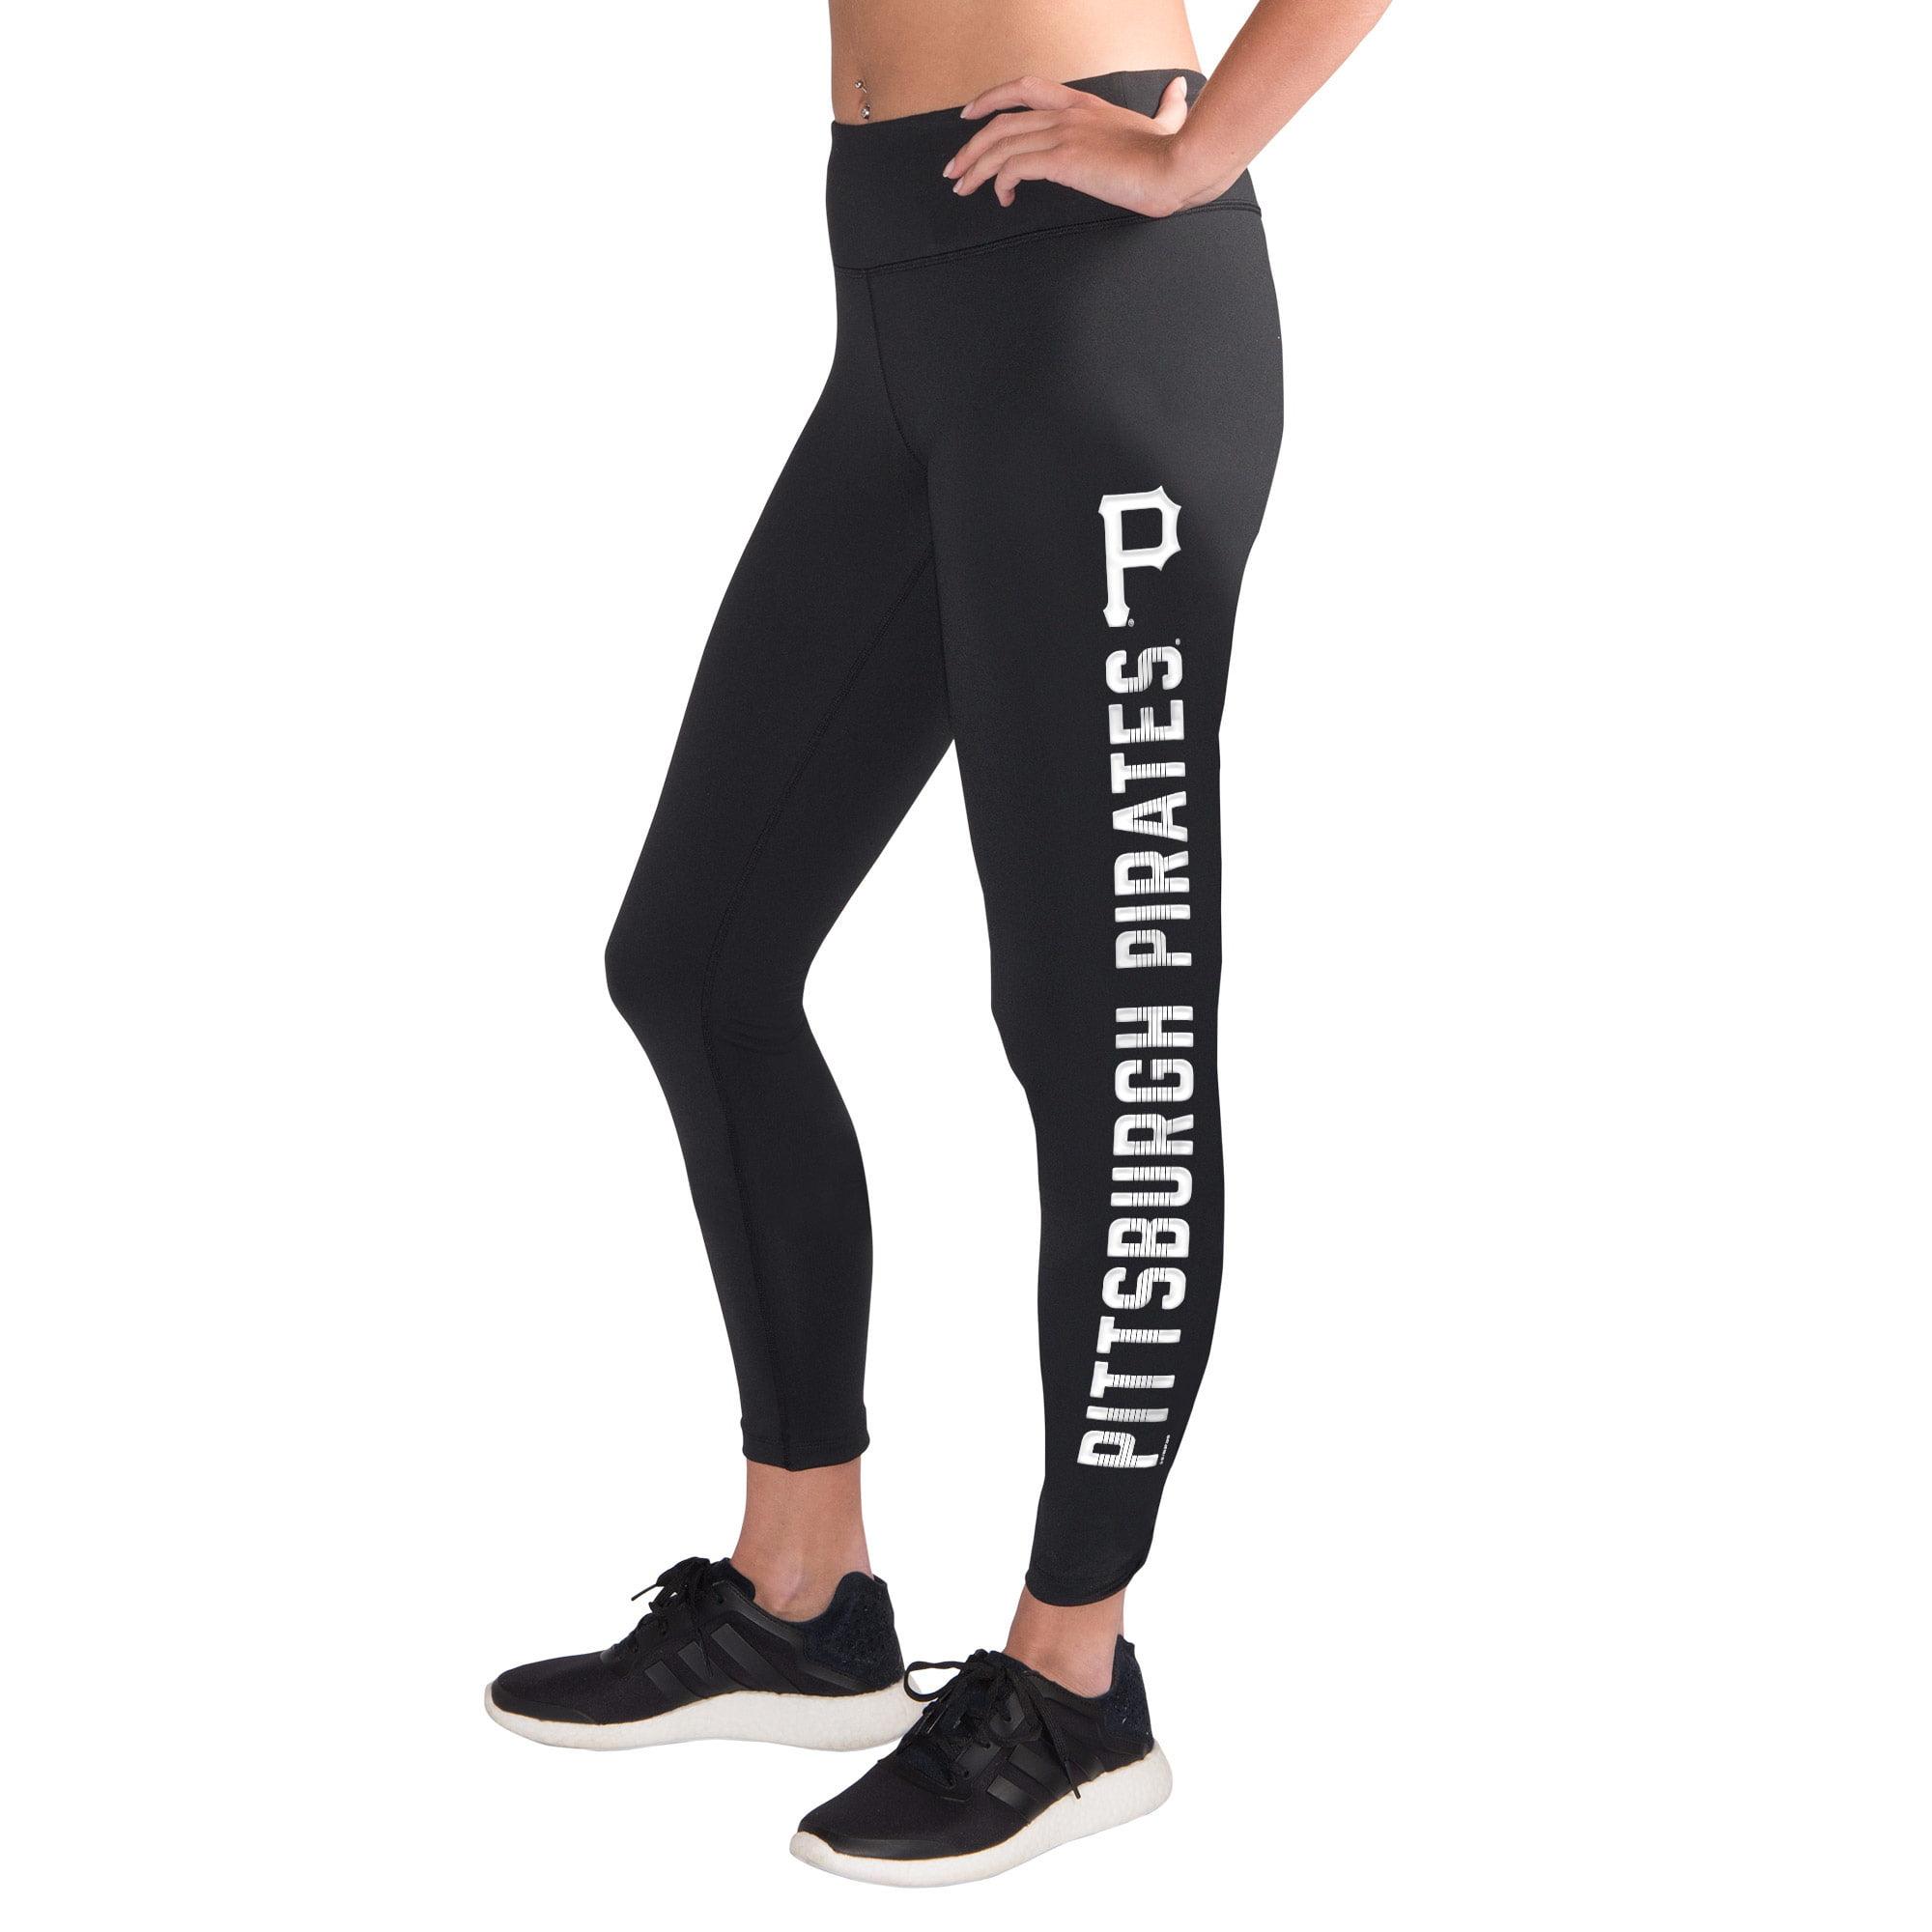 Pittsburgh Pirates G-III 4Her by Carl Banks Women's Base Runner Leggings - Black